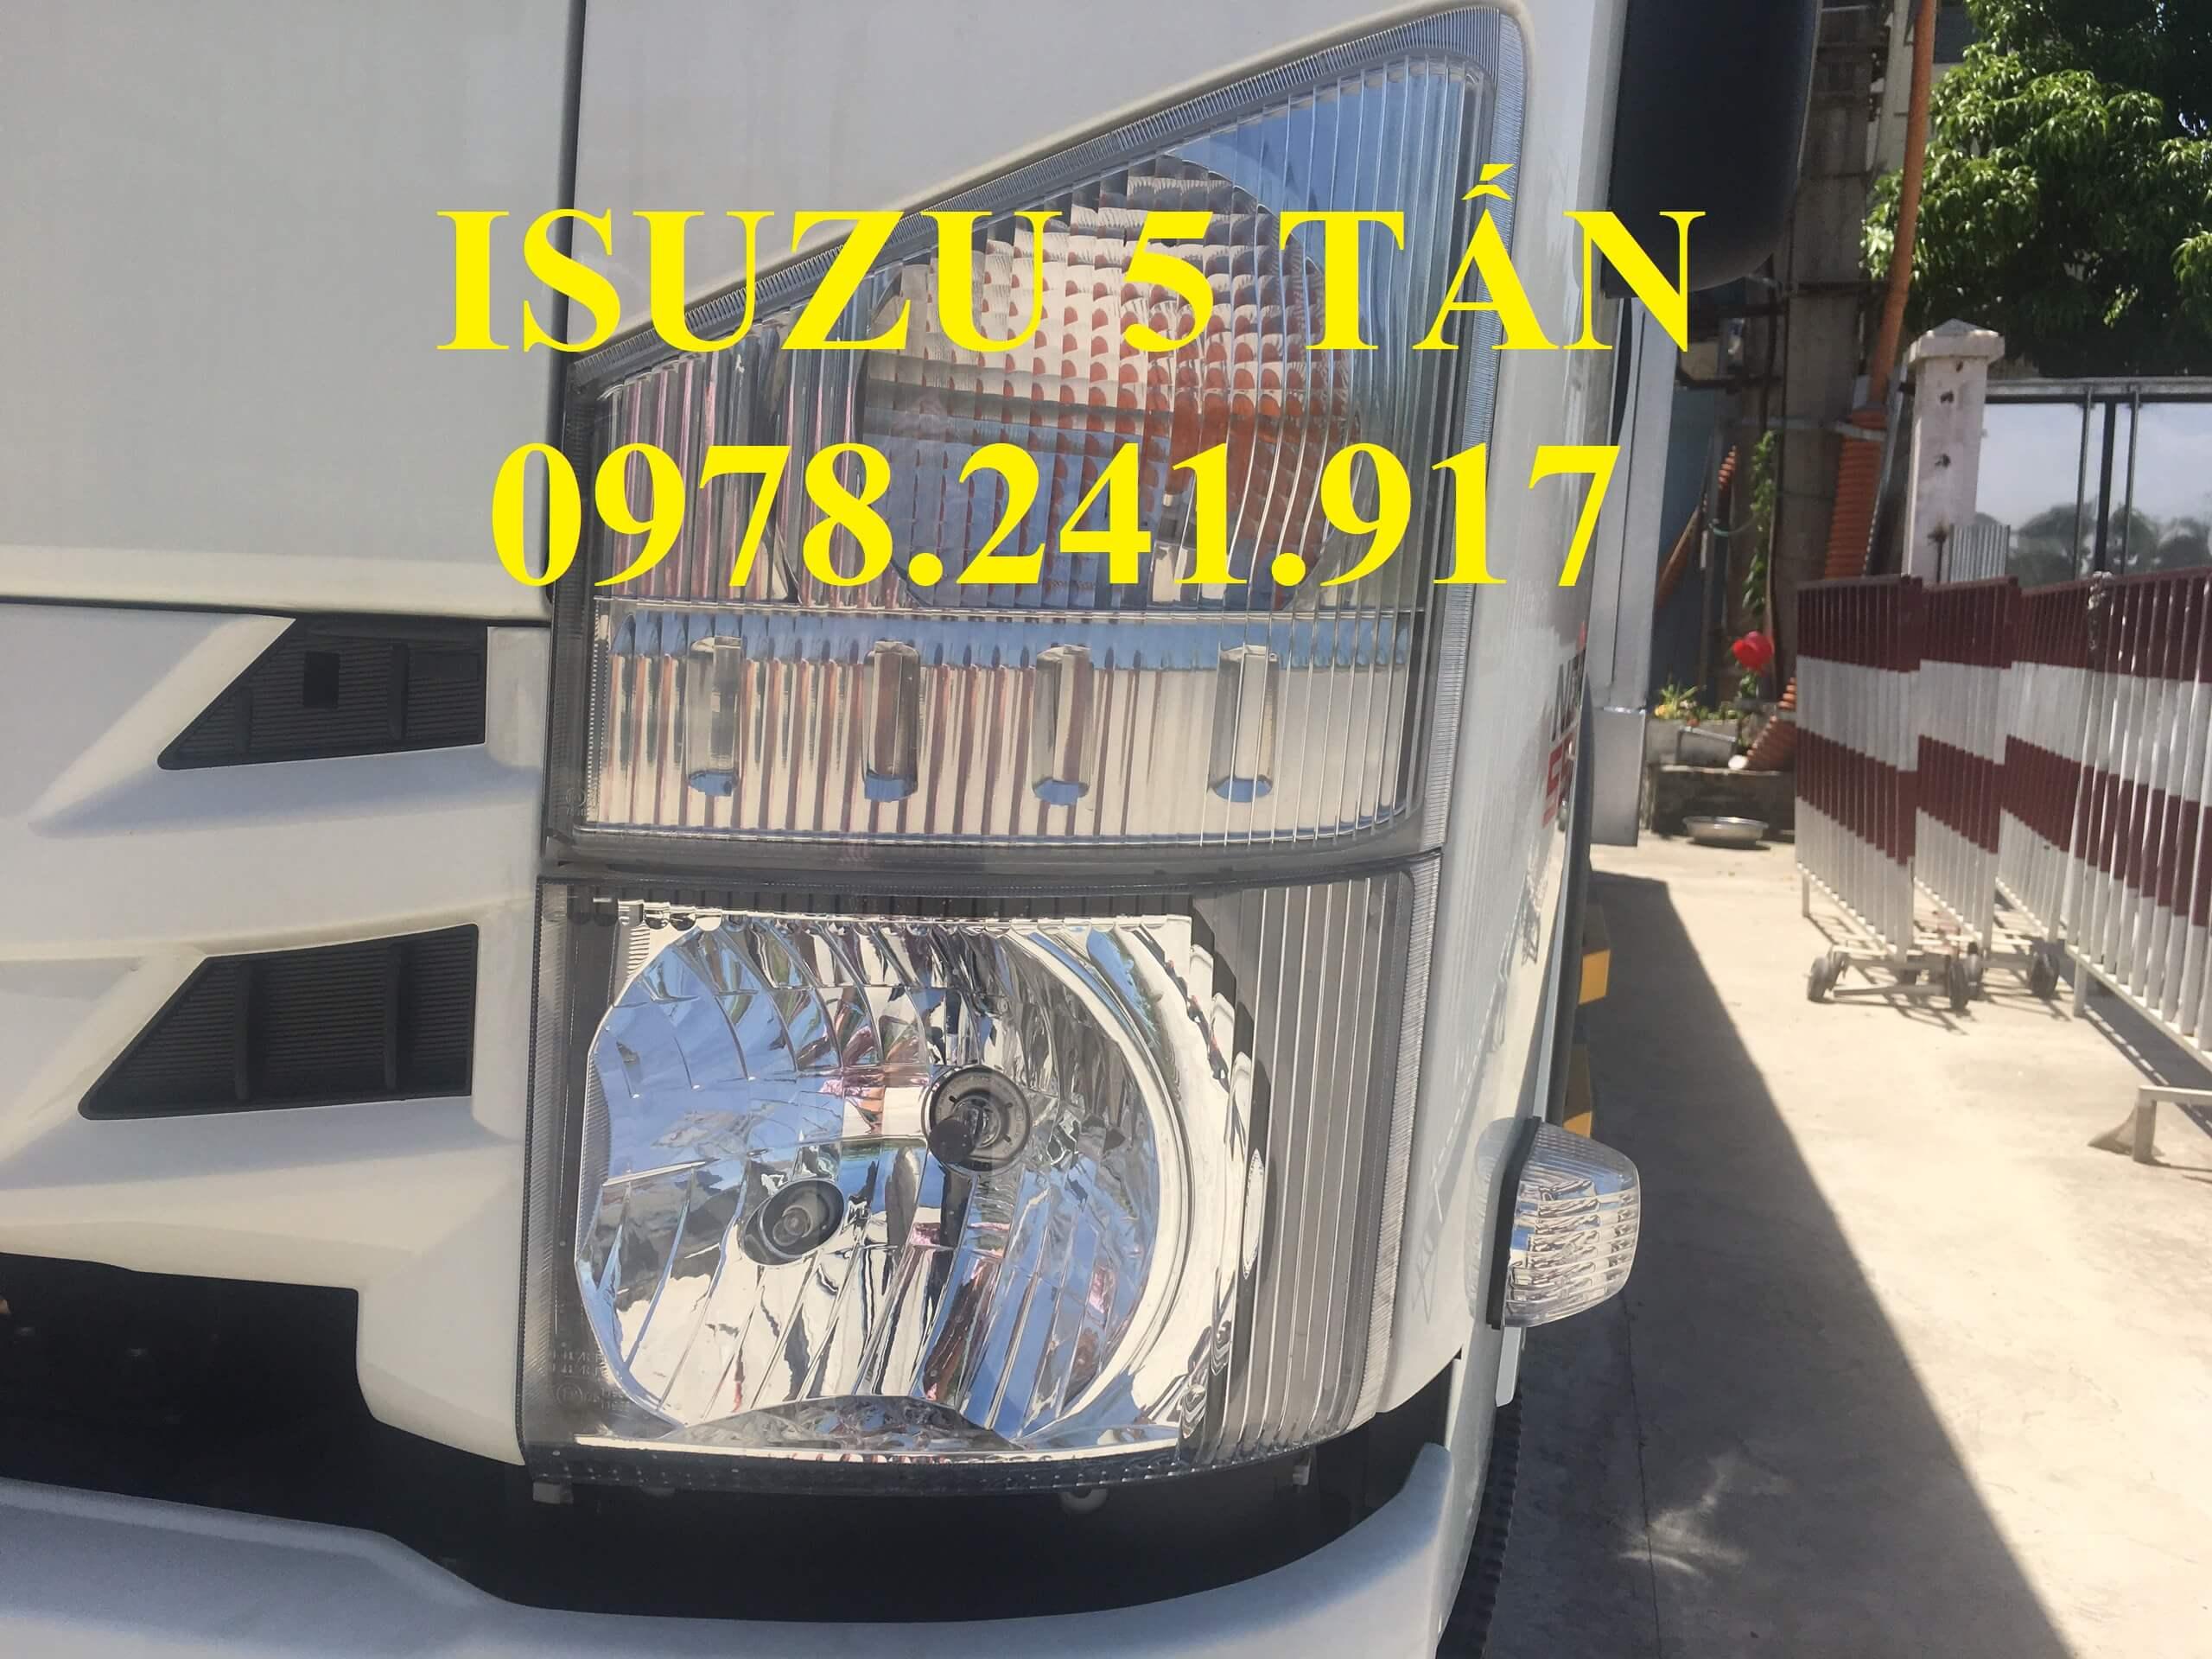 xe tải isuzu nqr75m 5 tấn cụm đèn pha